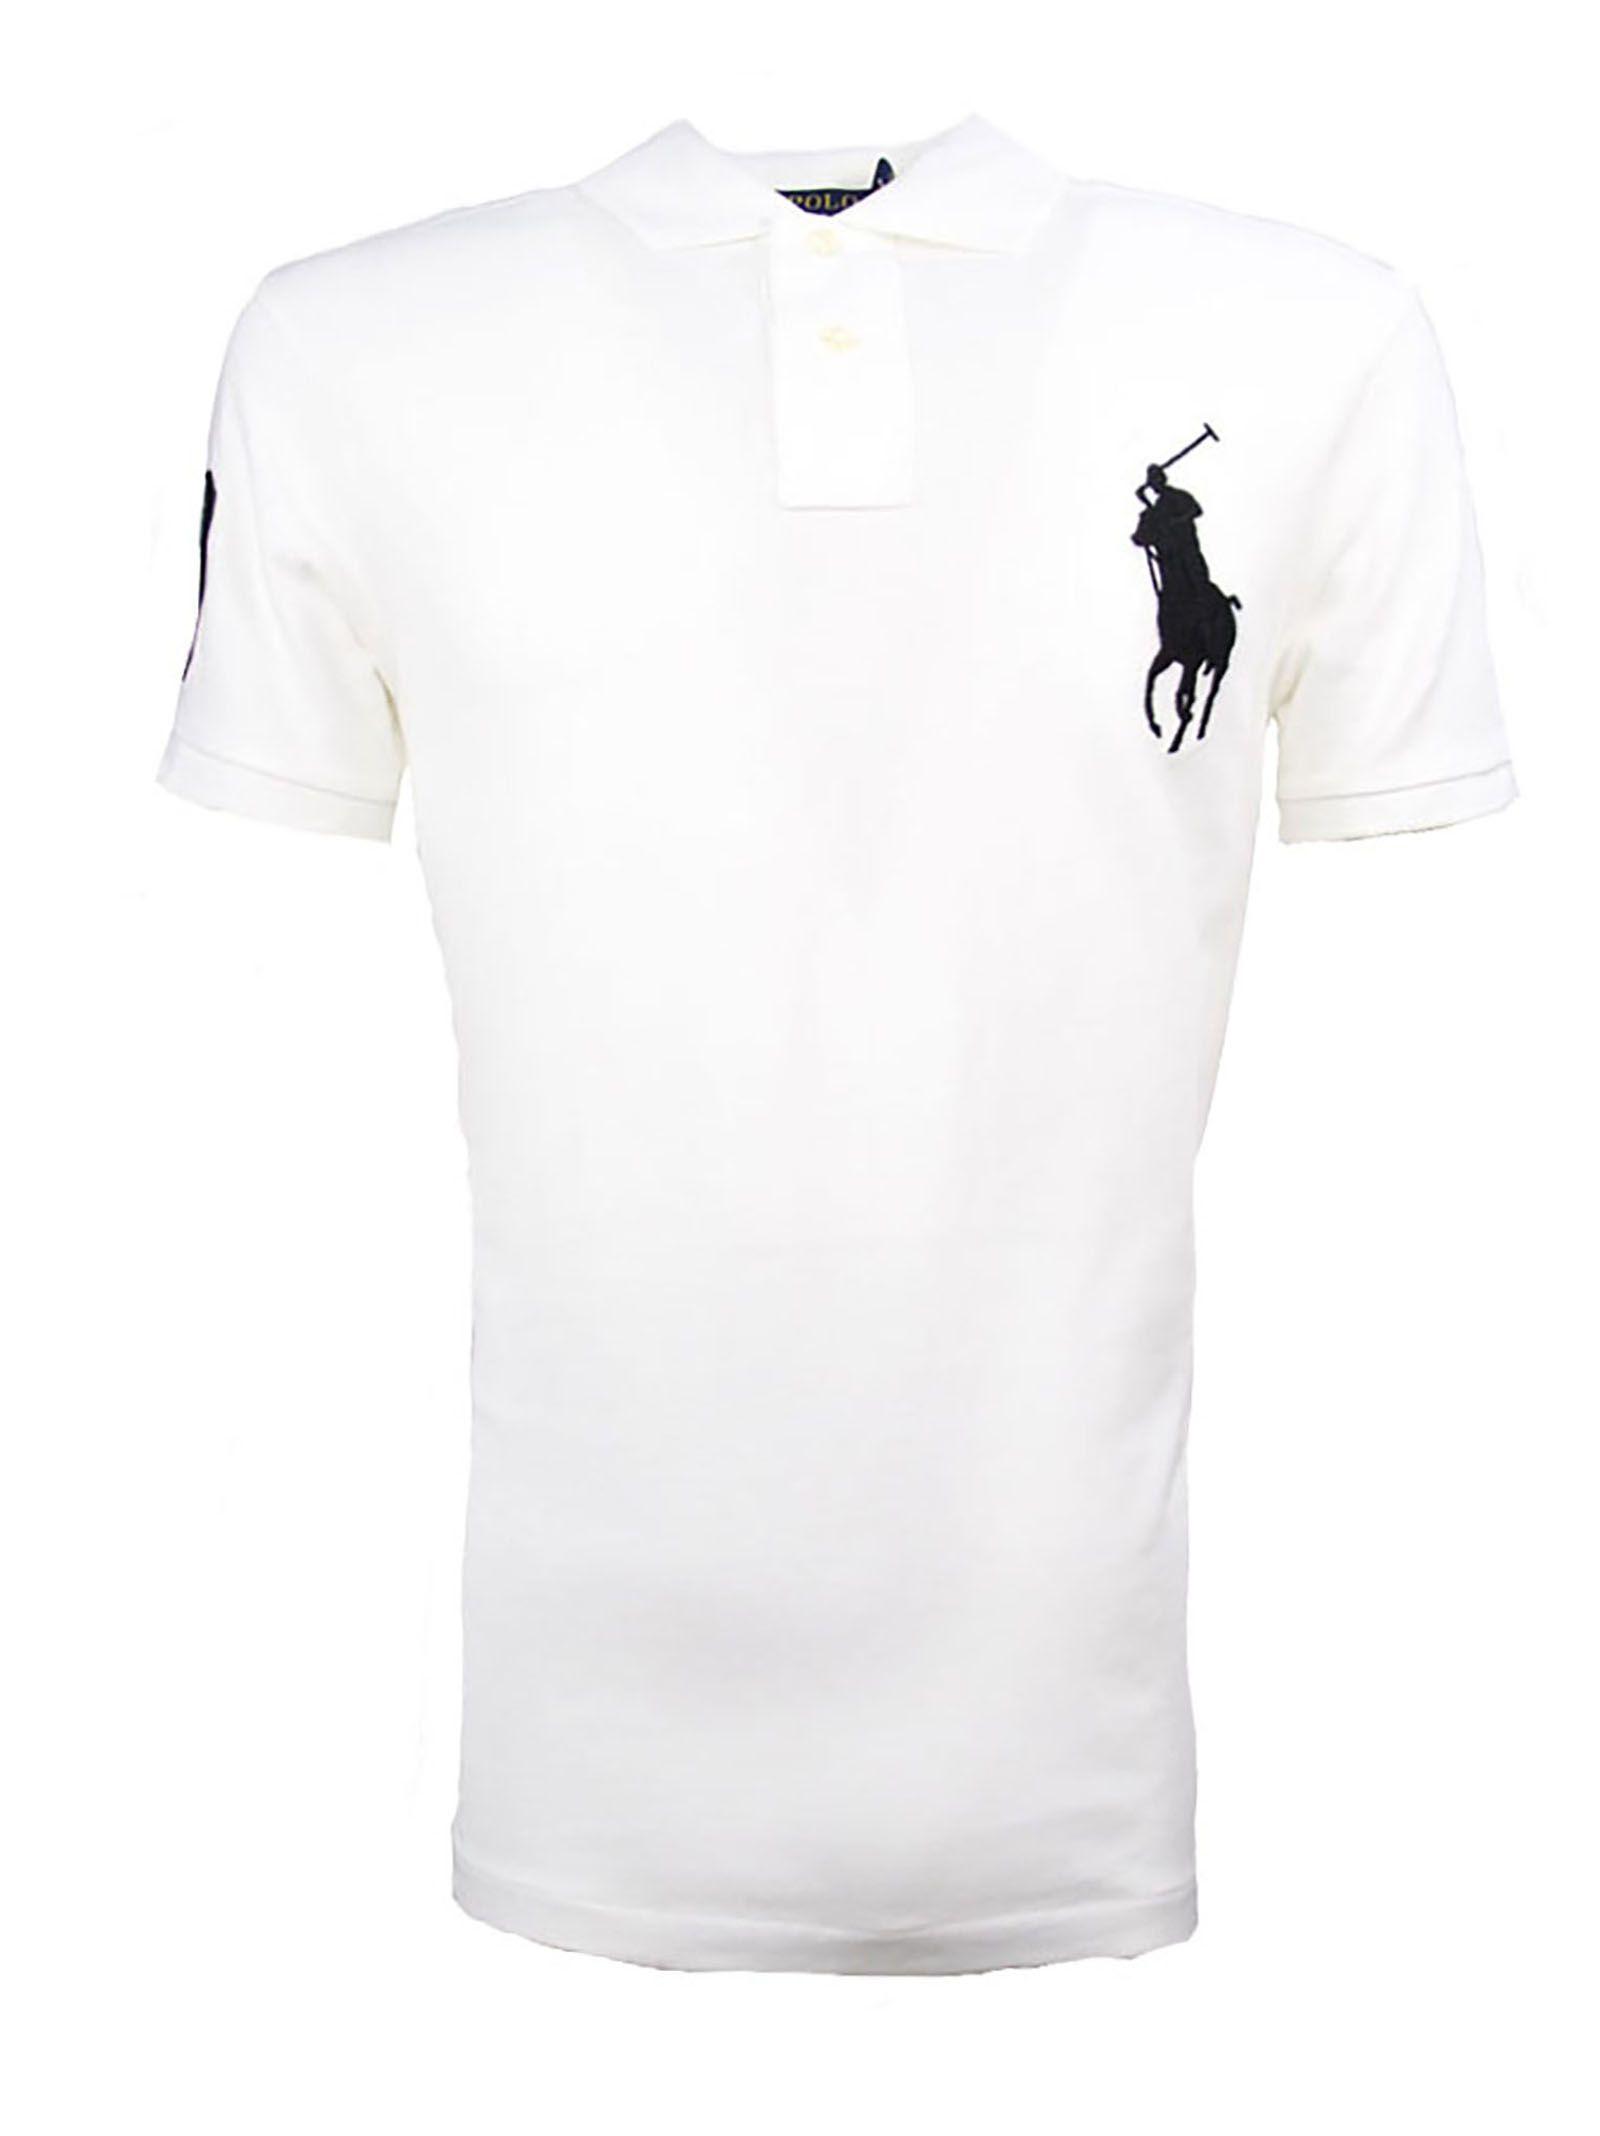 baf7846ef07c Ralph Lauren Ralph Lauren White Cotton Polo Shirt - Bianco ...